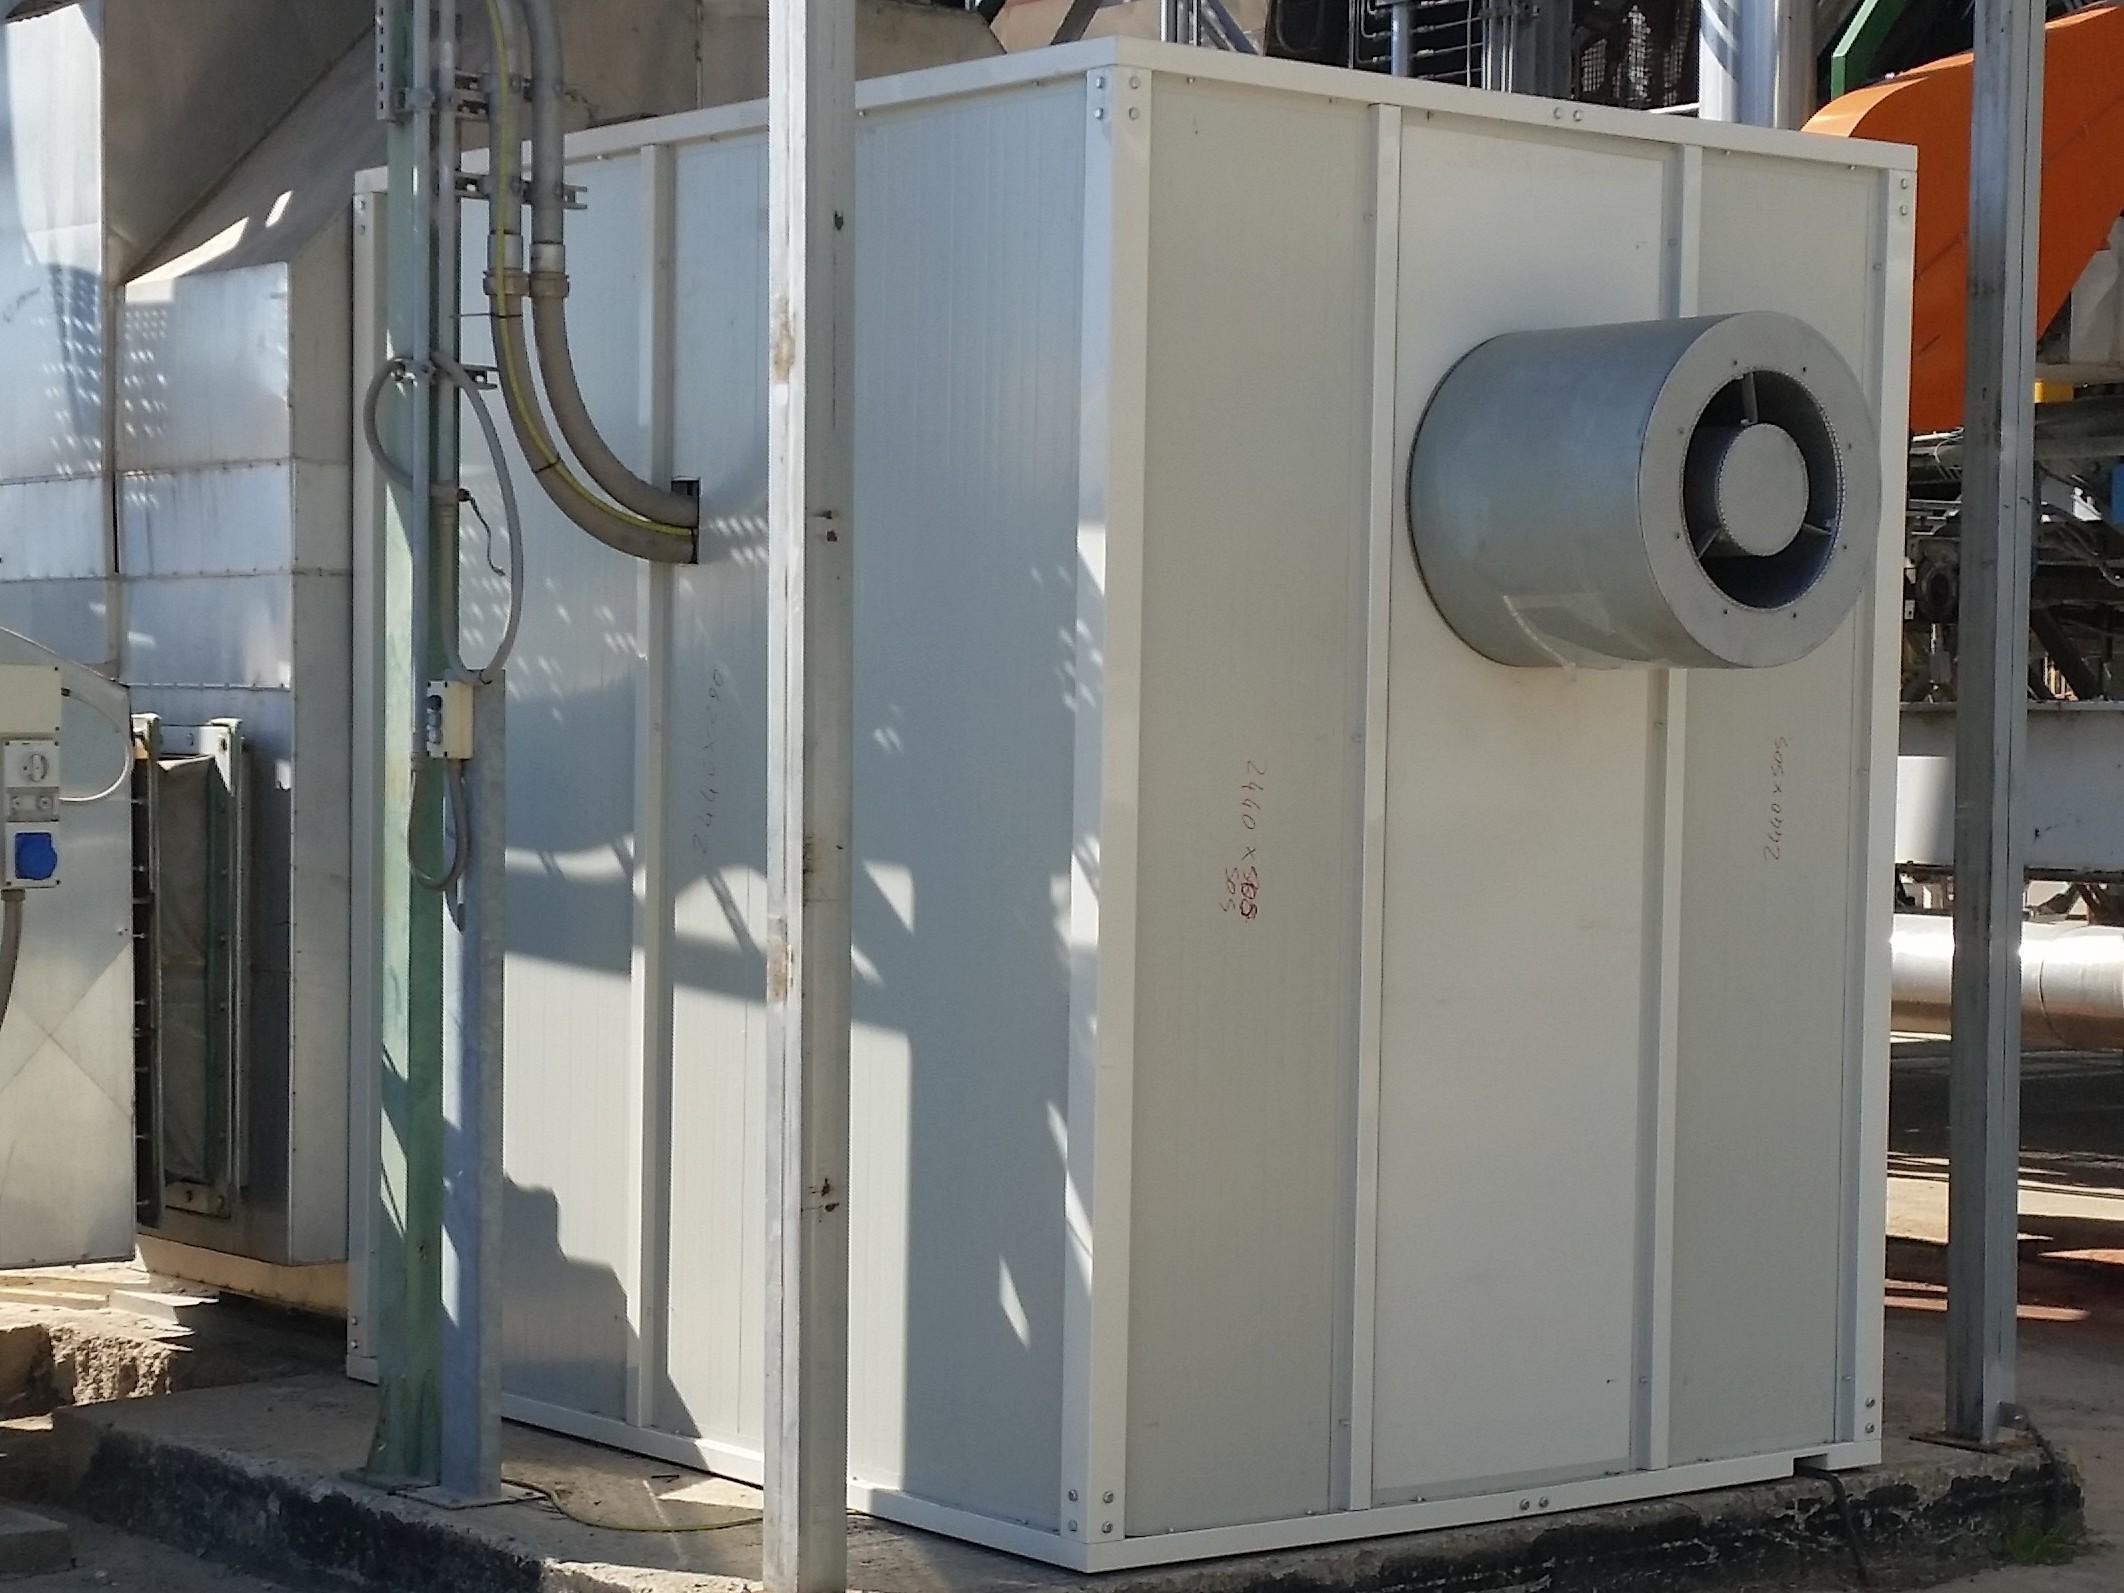 SVC for Enclosure Ventilation